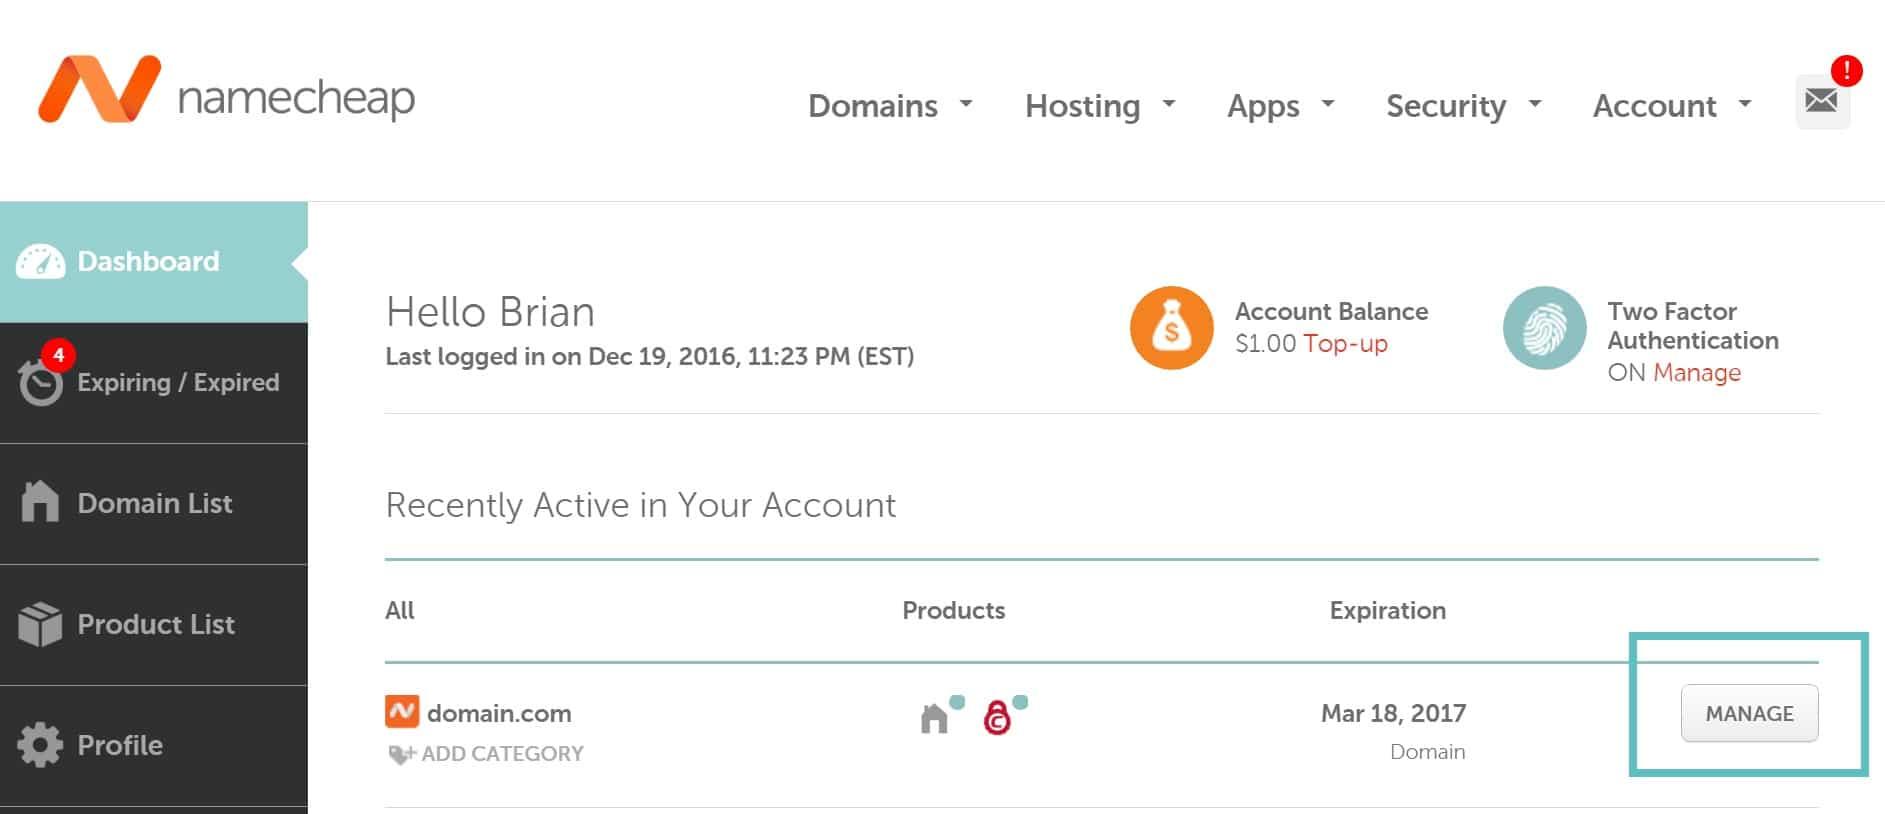 namecheap manage domain